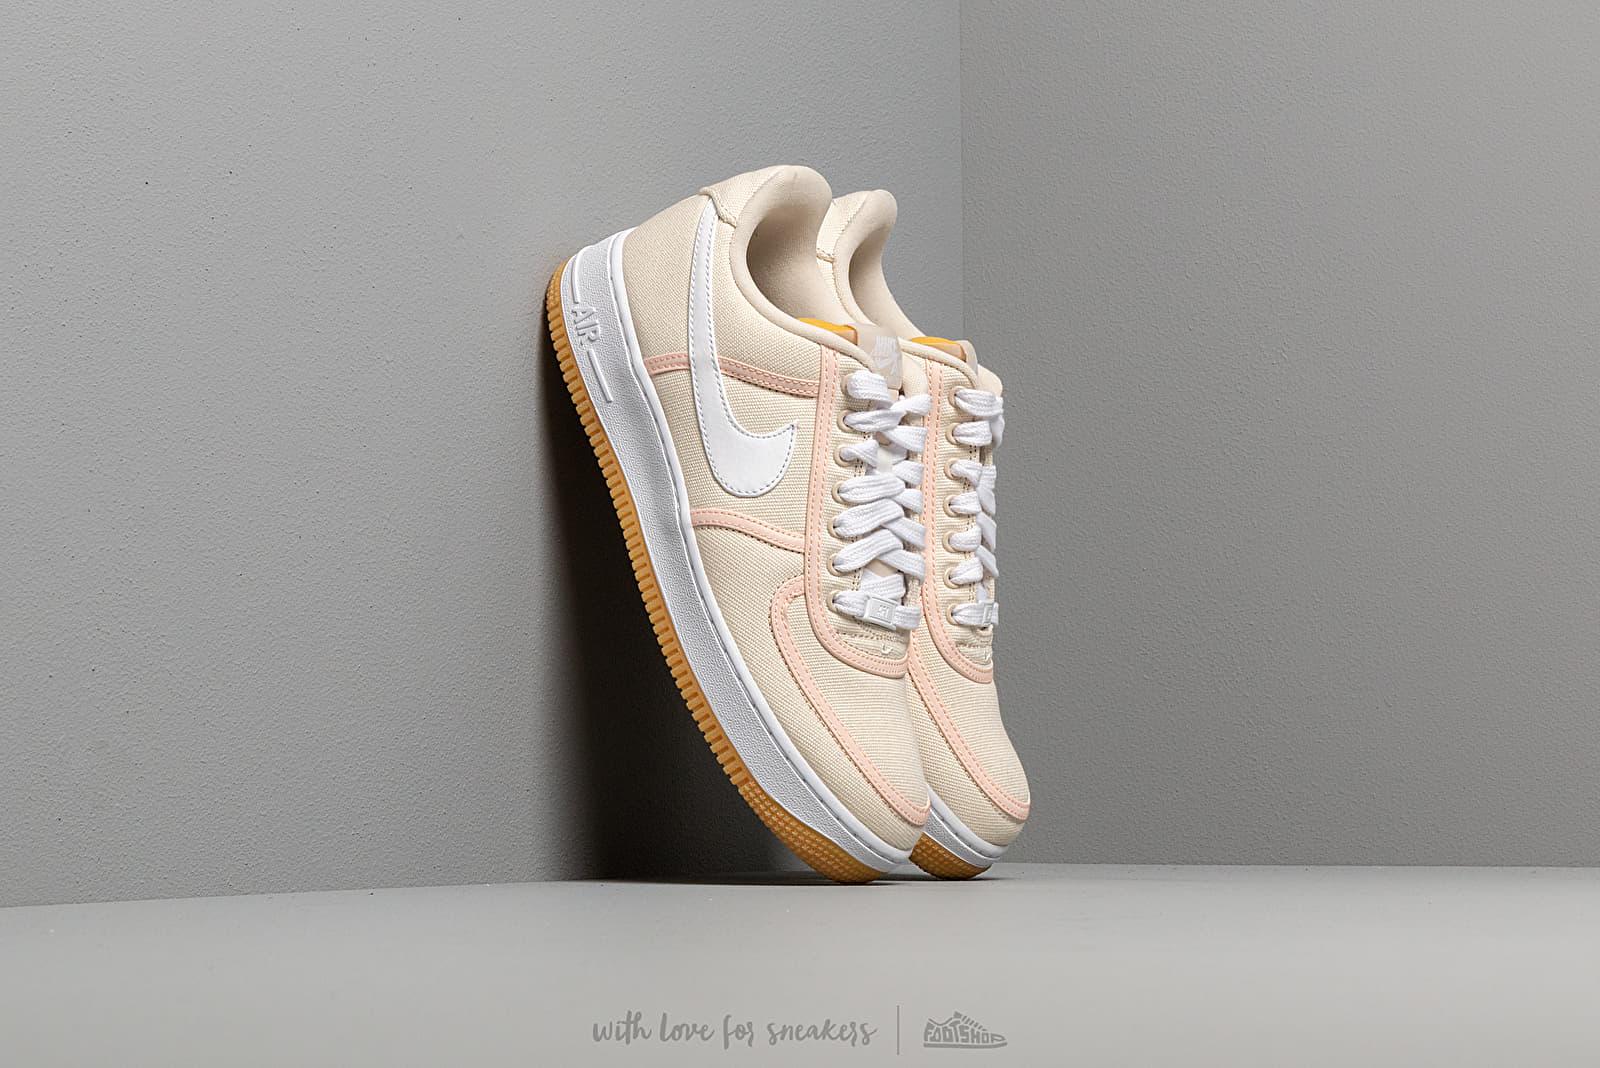 Nike Air Force 1 '07 Premium Light Cream/ White-Crimson Tint za skvelú cenu 110 € kúpite na Footshop.sk